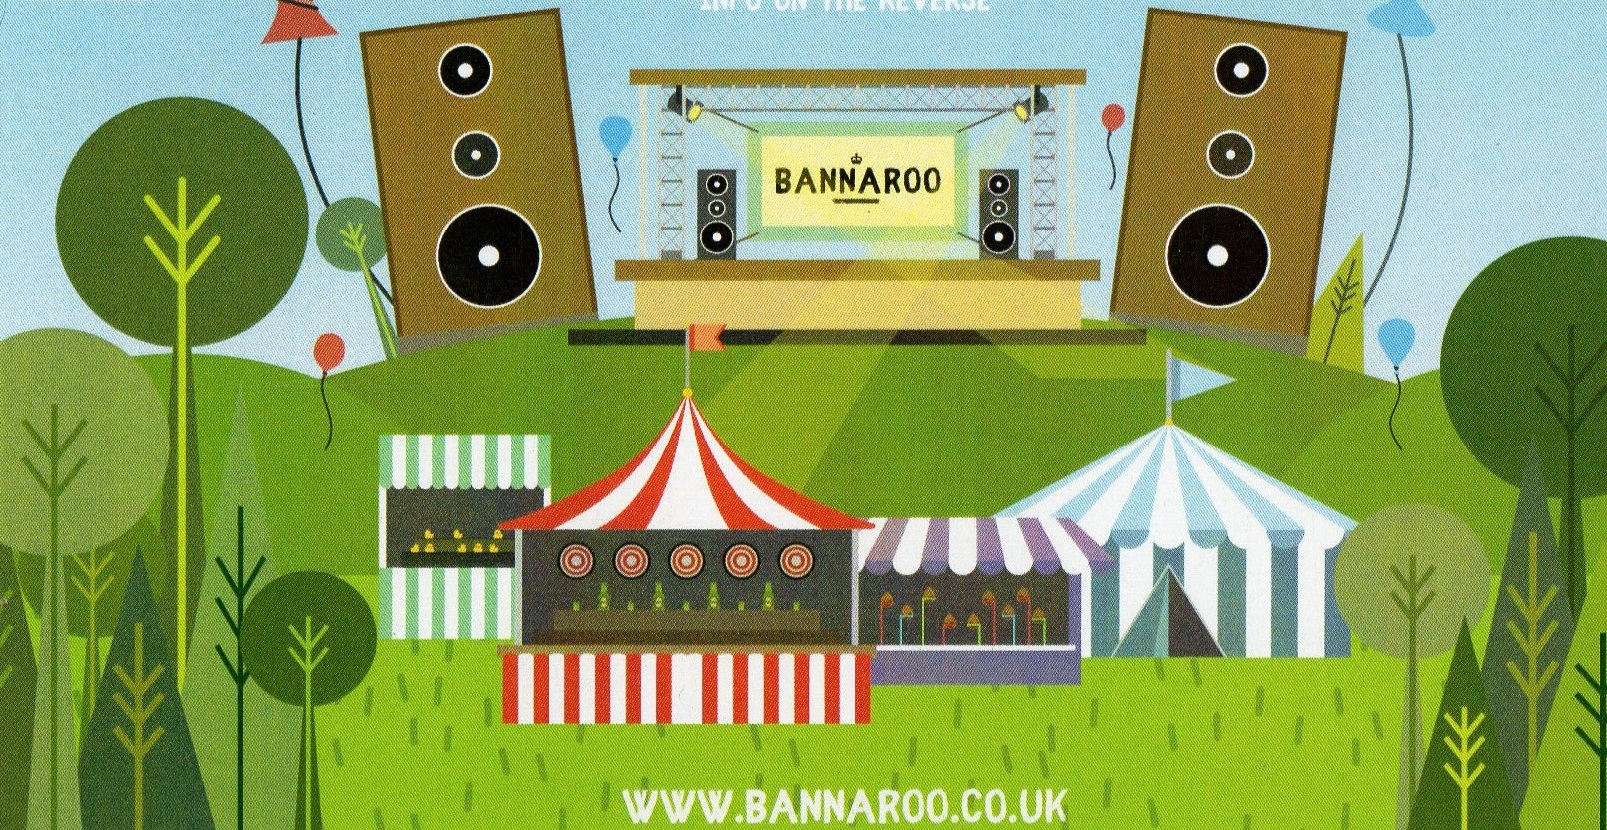 Bannaroo Music Festival